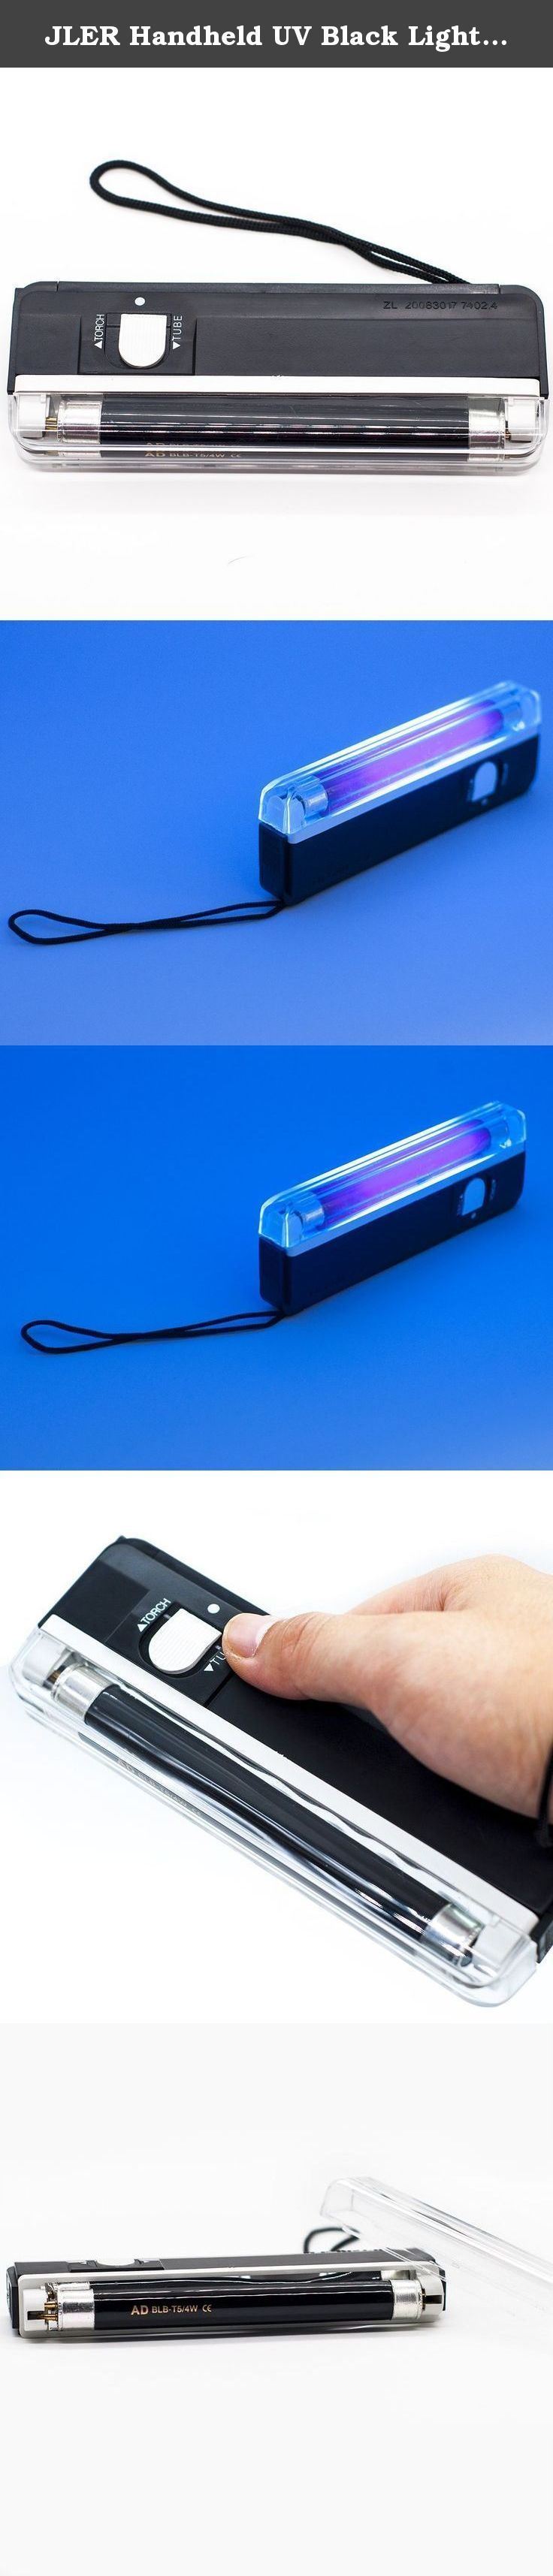 17 best ideas about black light flashlight on pinterest black light bulbs. Black Bedroom Furniture Sets. Home Design Ideas